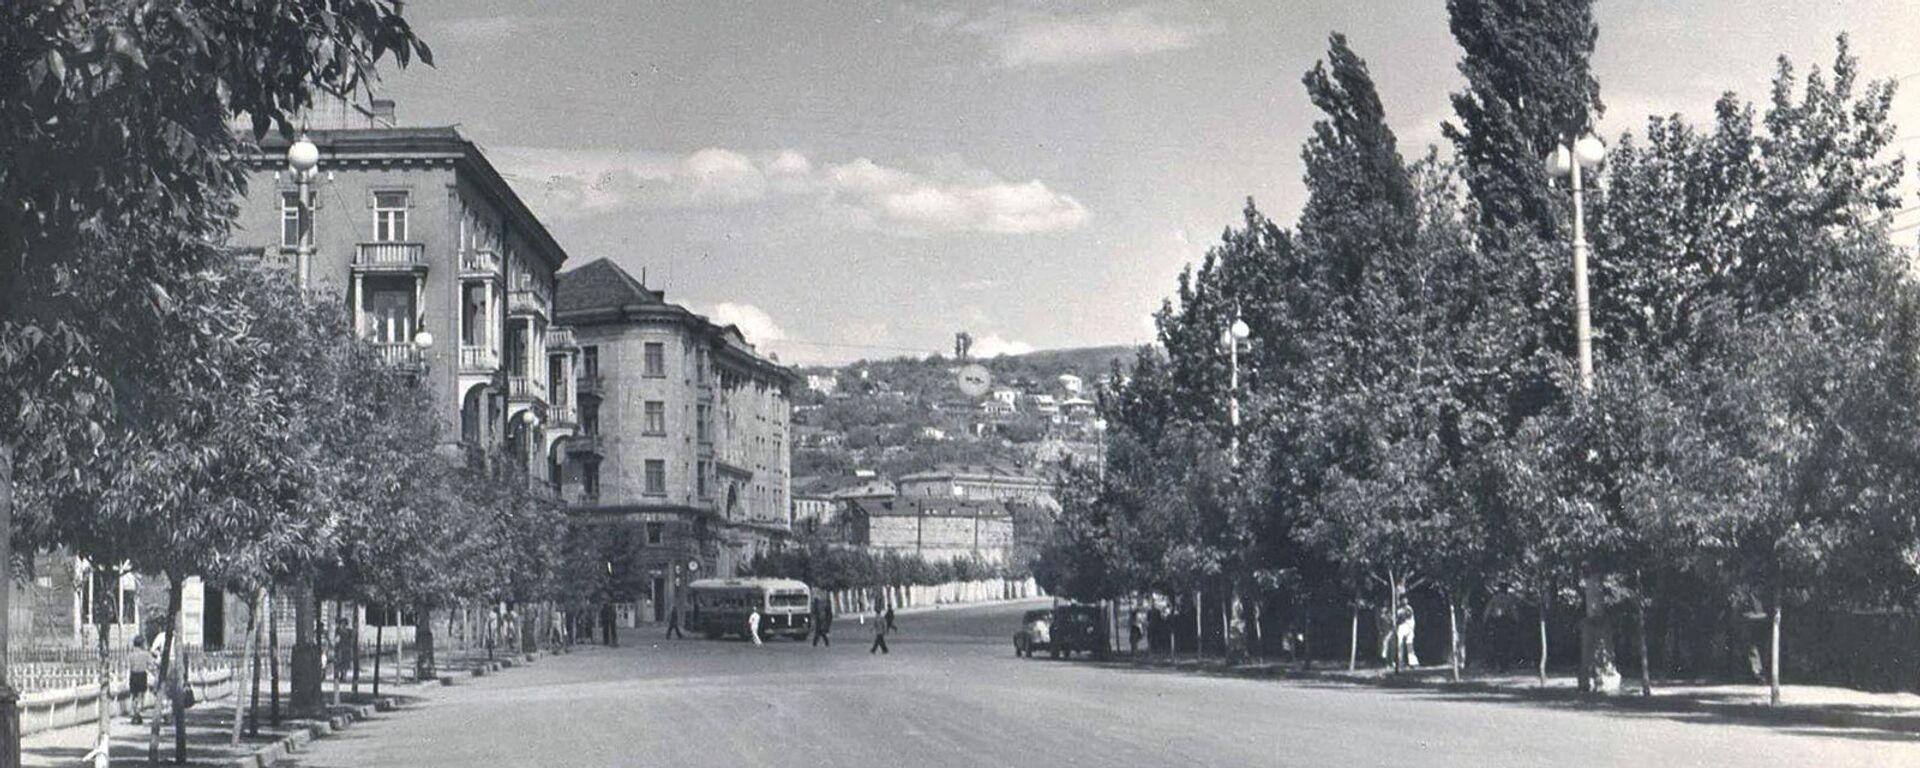 Улица Московян в Ереване (1954 год) - Sputnik Армения, 1920, 12.08.2021